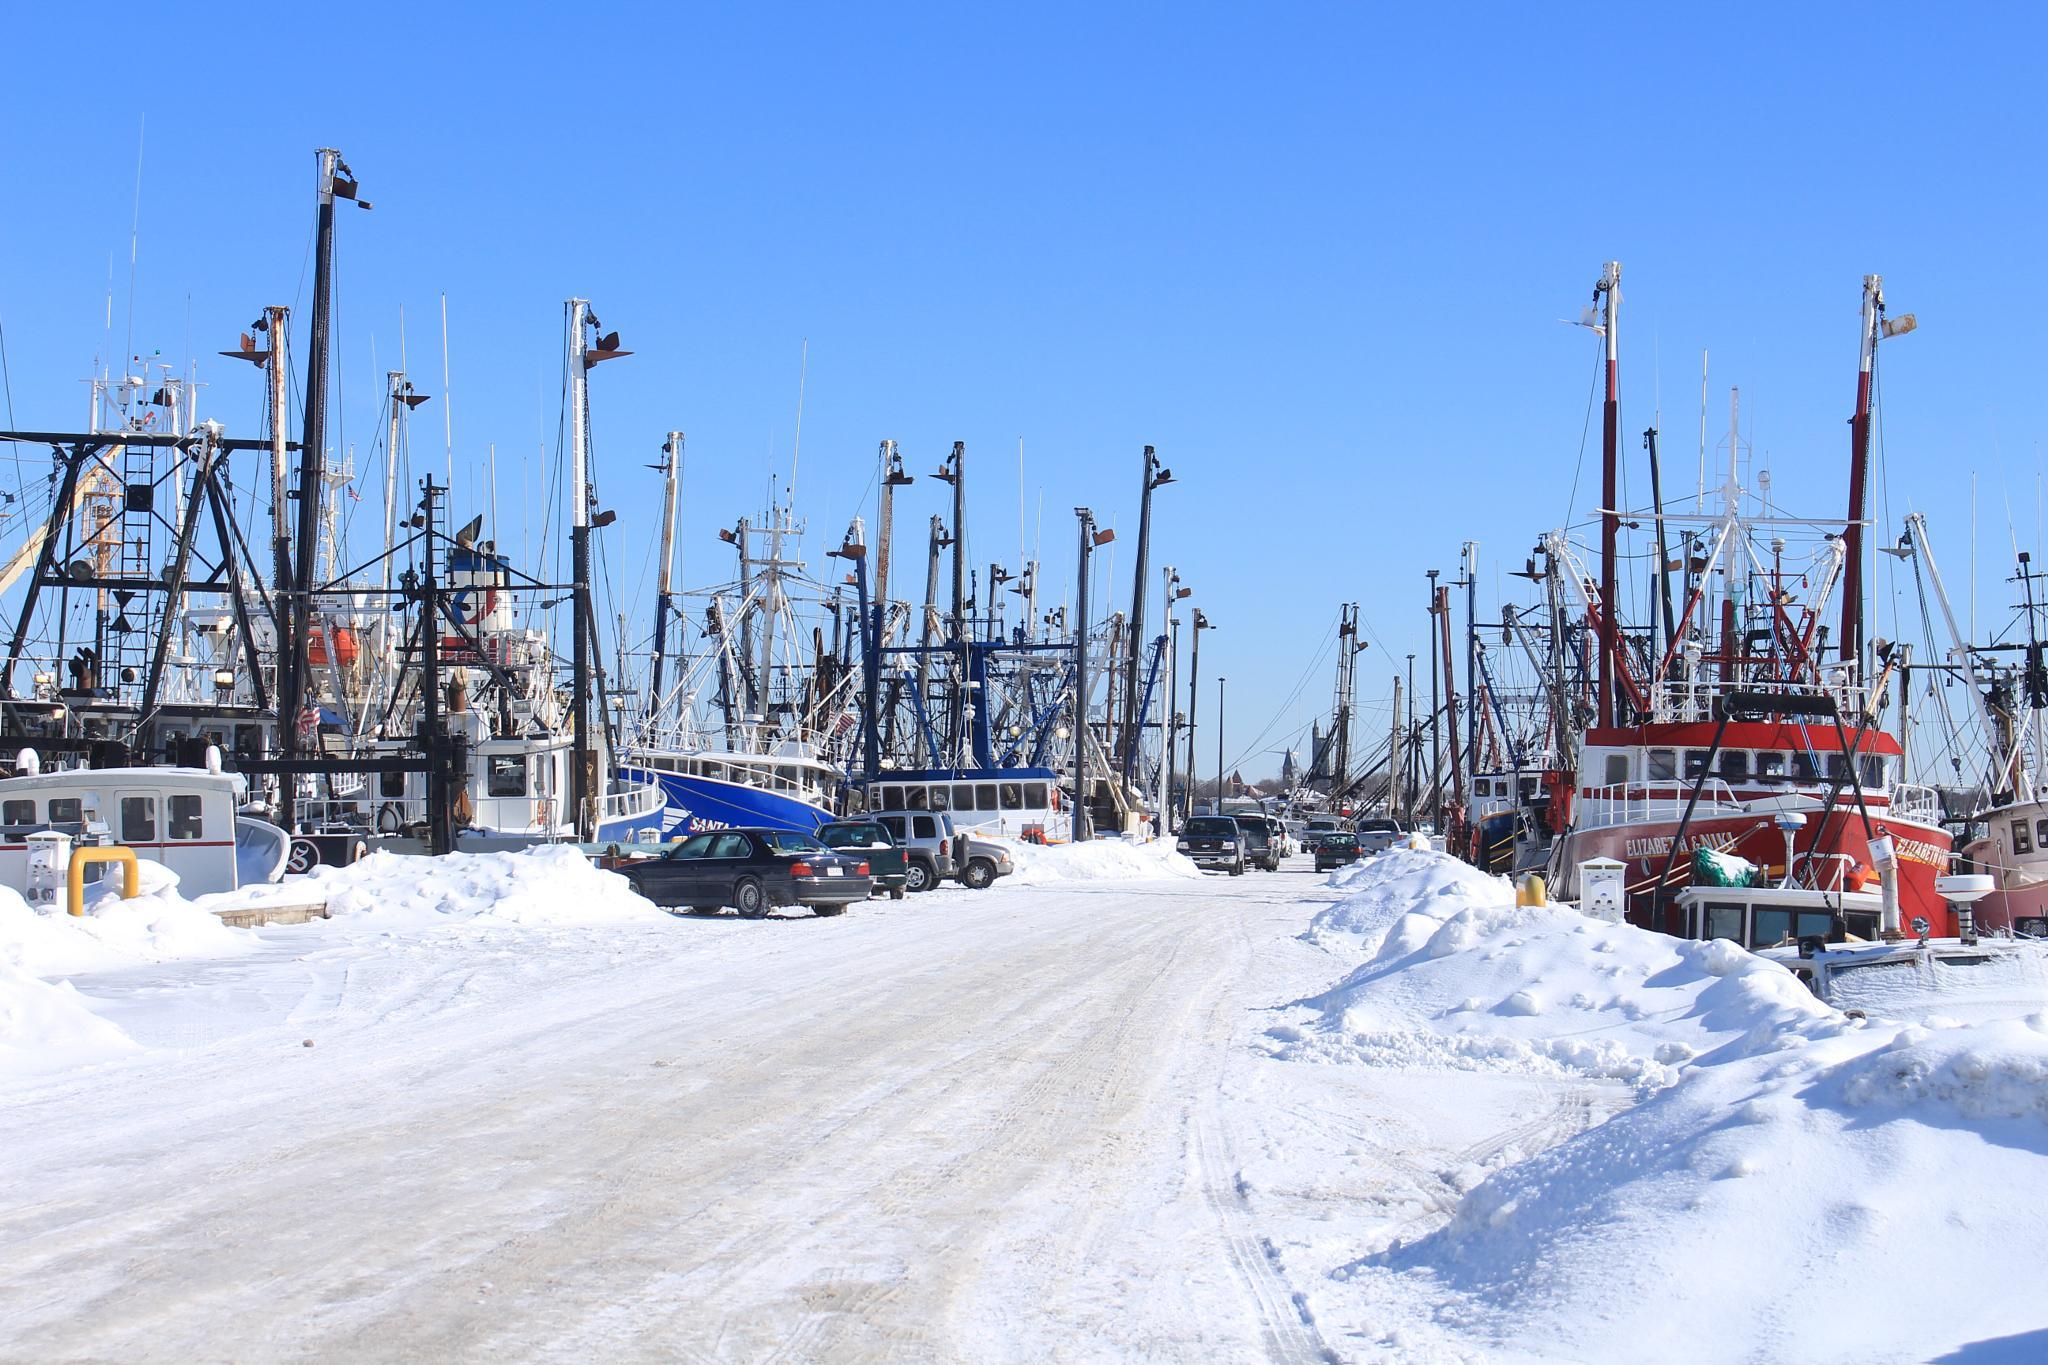 Snow in the port. by prterrero92